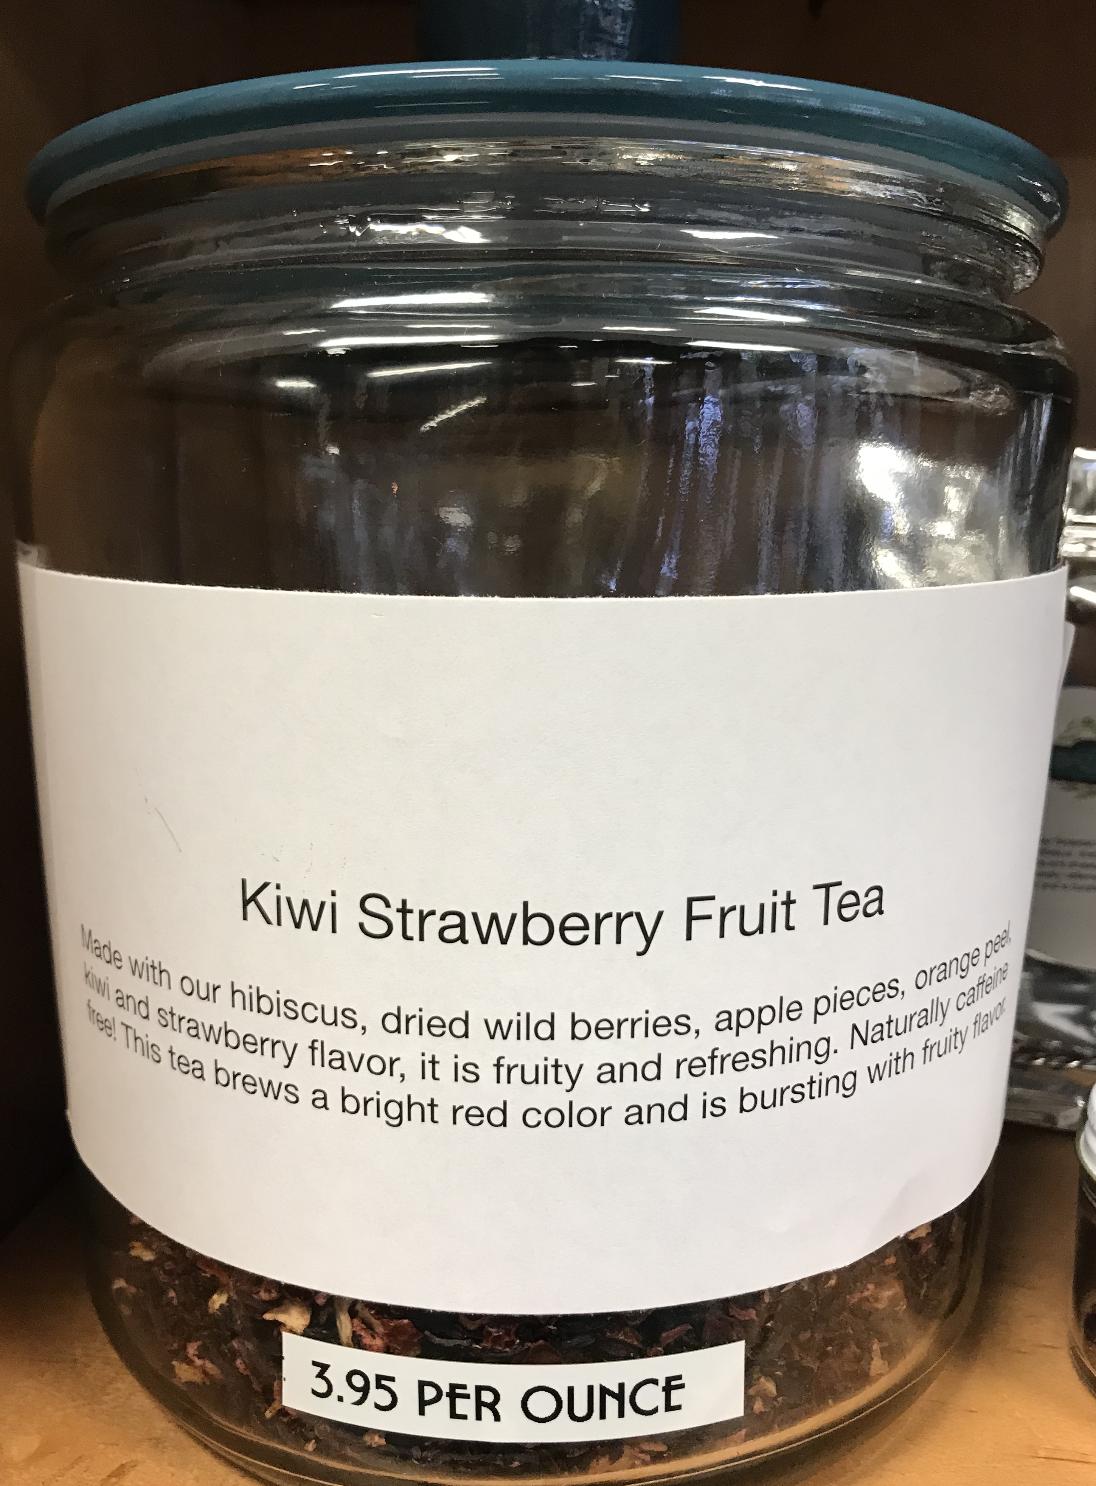 Kiwi Strawberry Tea per ounce